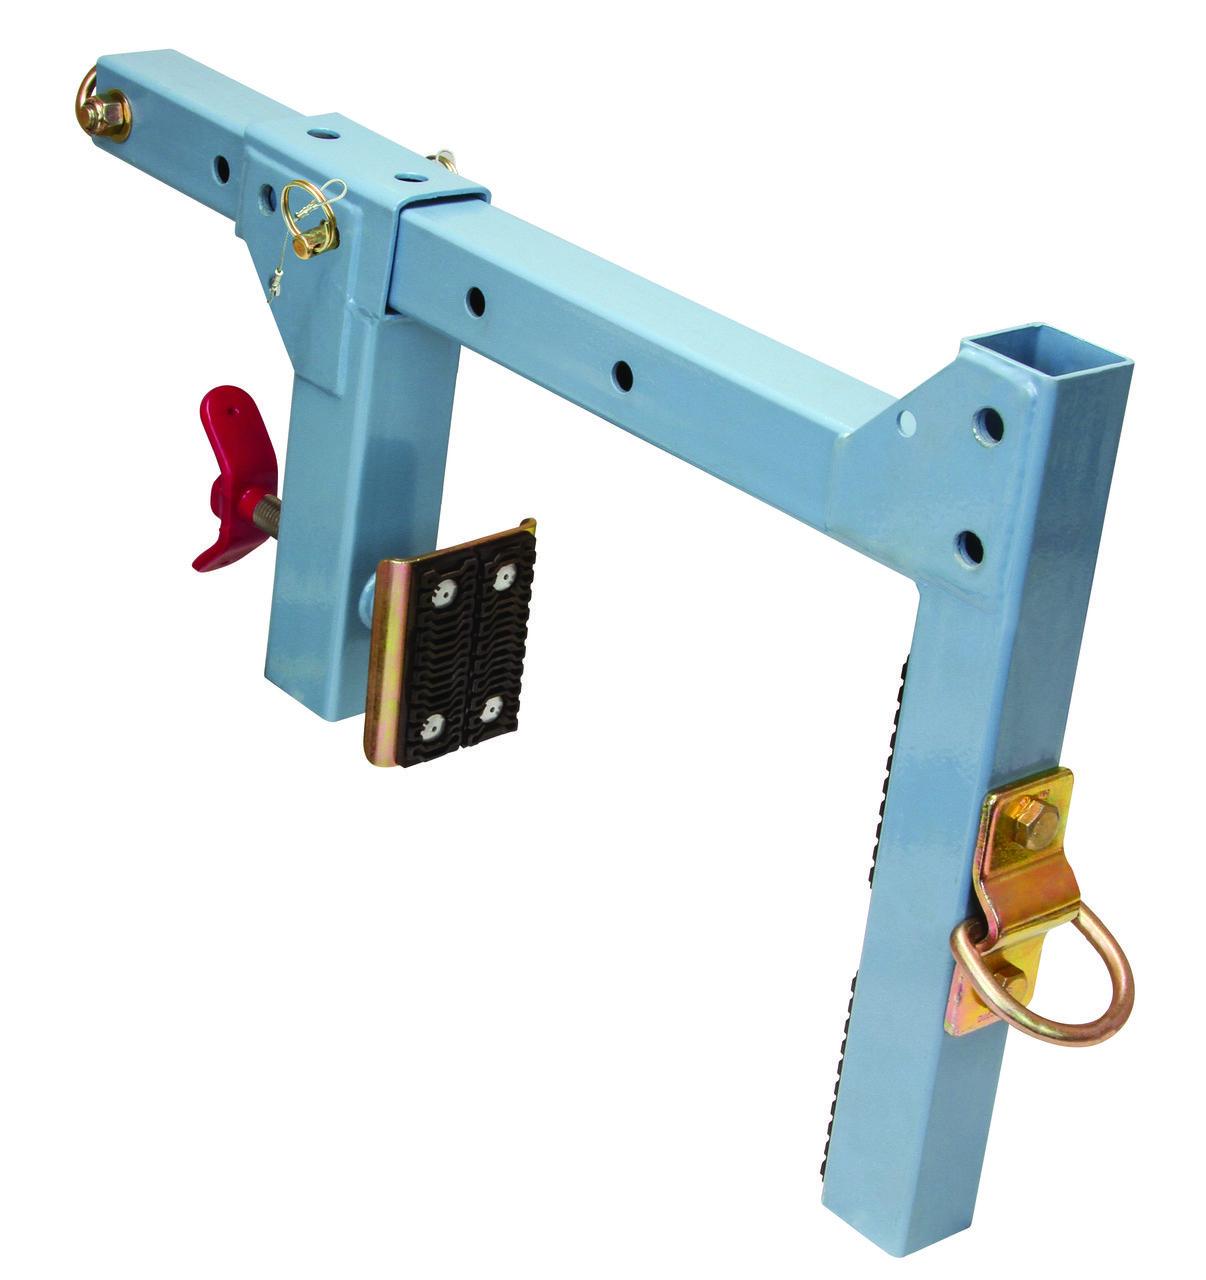 "FallTech 7460A Parapet Wall Anchor 1/2"" to 15"" OSHA"